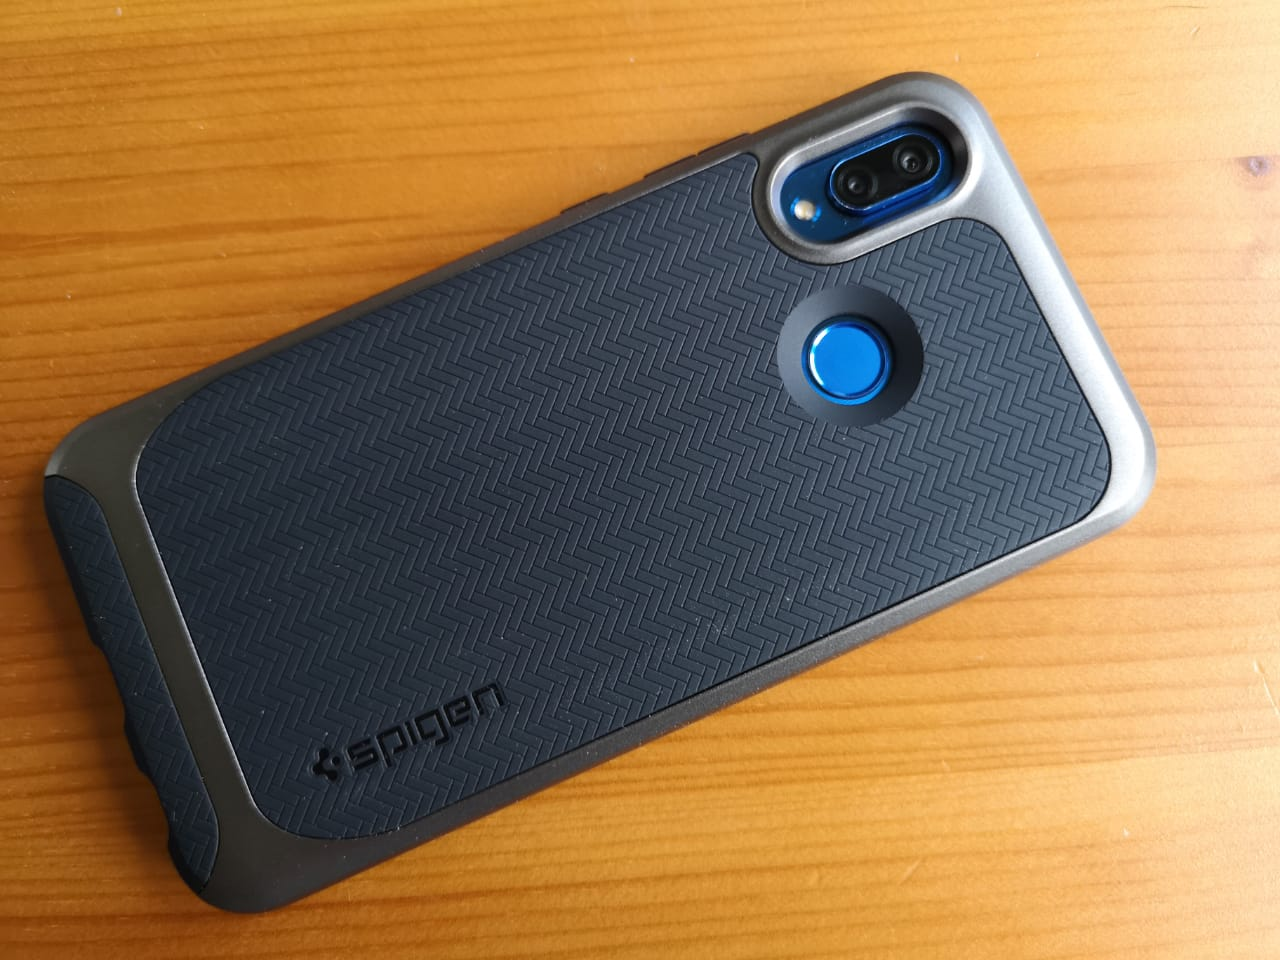 Huawei_P20_lite_neo_hybrid_Hülle_Case_Spigen_Test_3